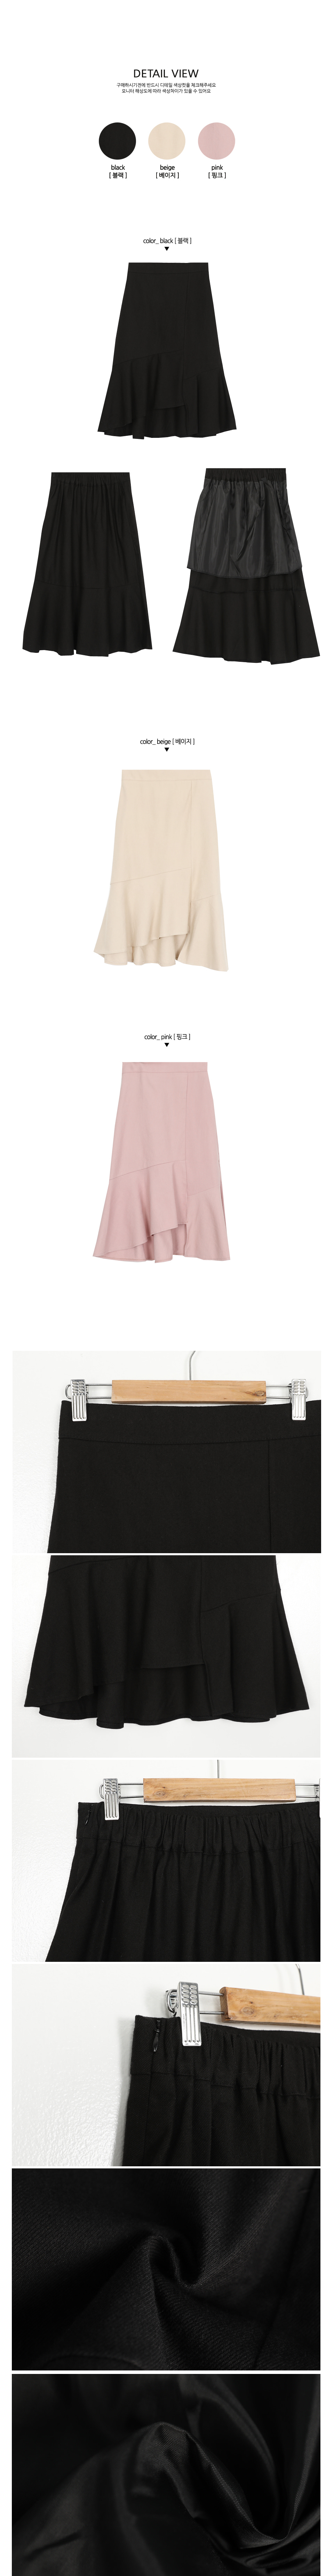 Hino cut incontinence skirt